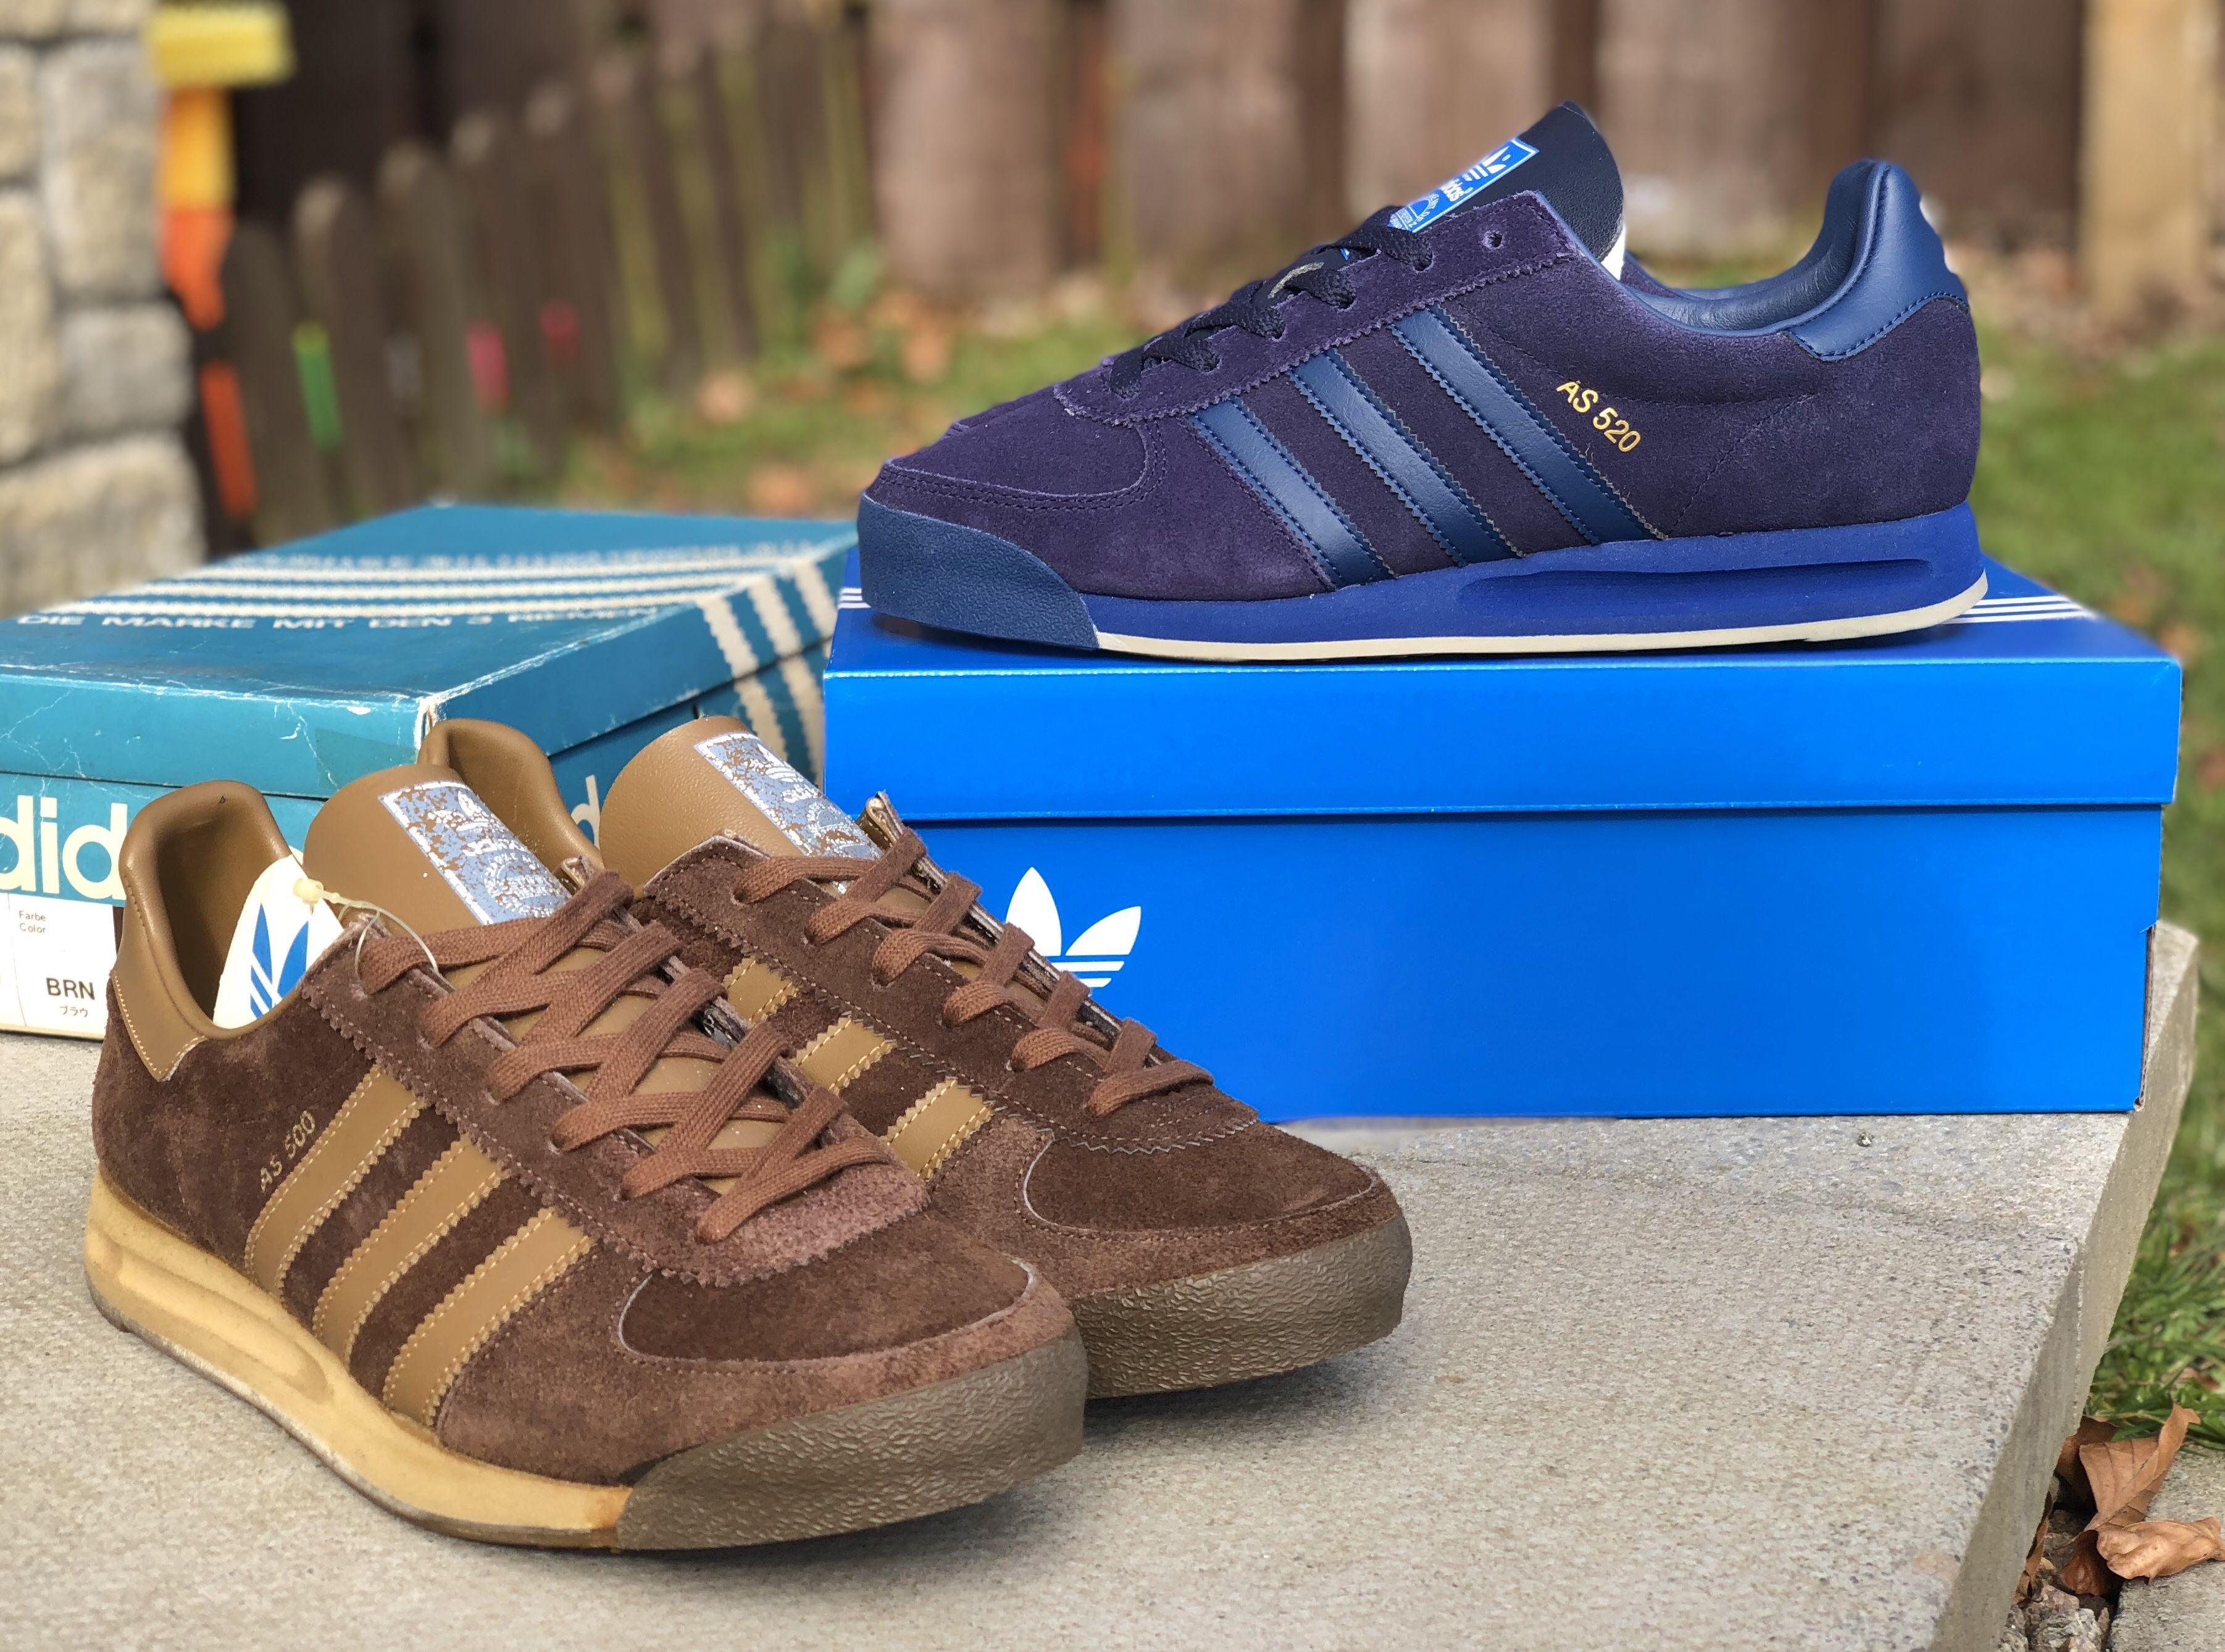 81e269ef25 Adidas AS520 Spzl vs AS500 | Things to wear in 2019 | Adidas ...